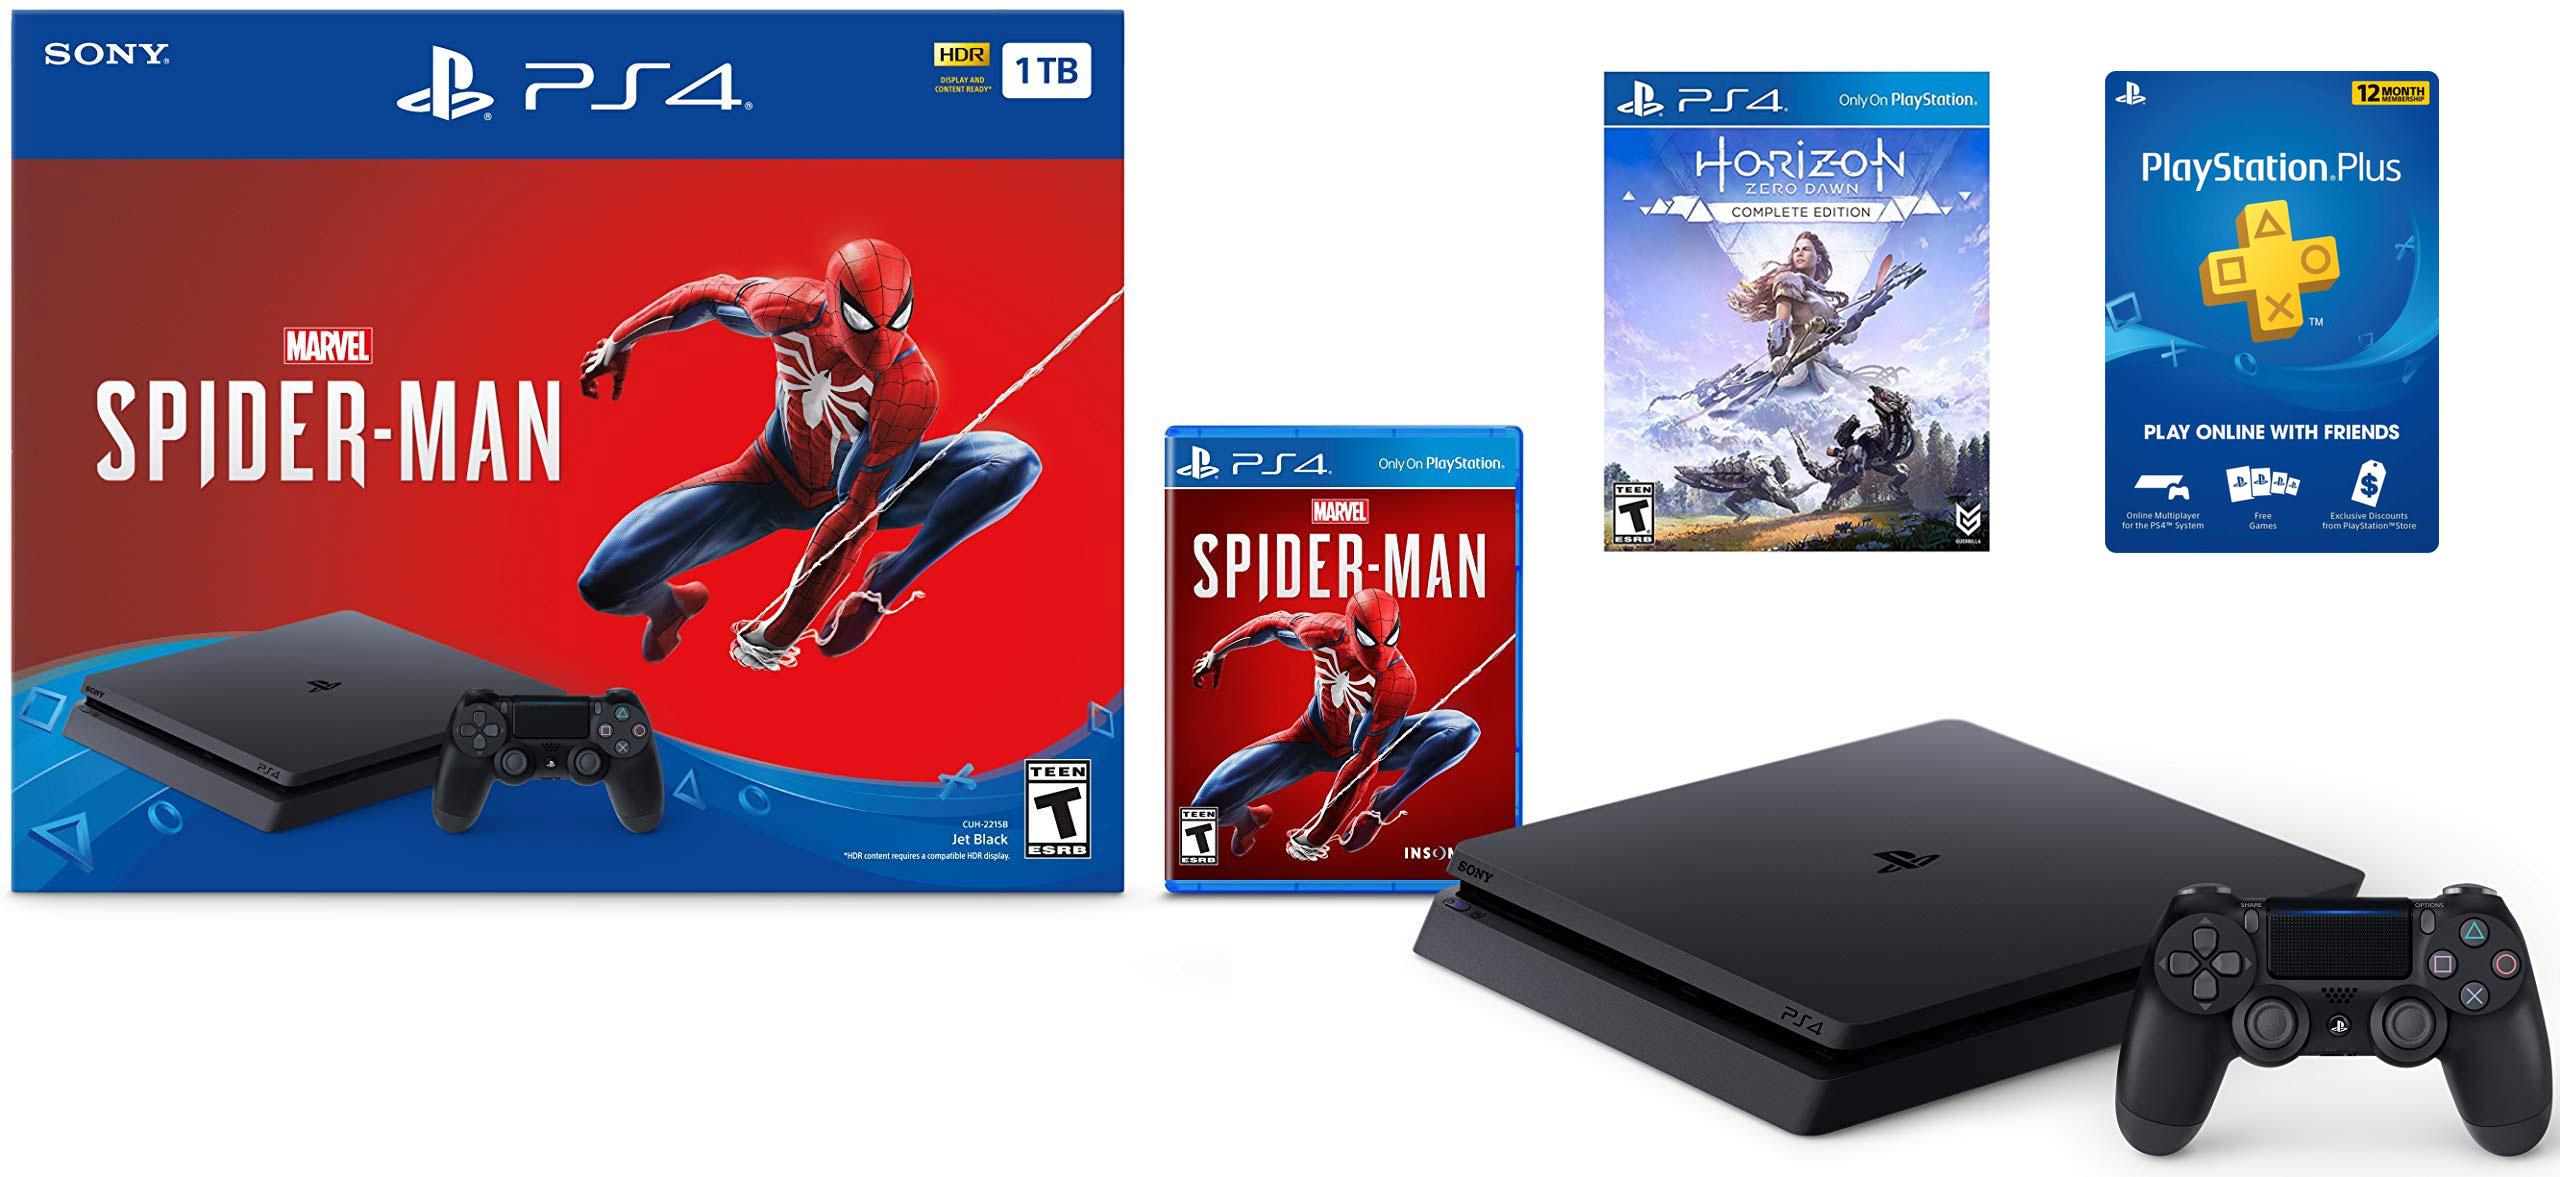 199 Ps4 Spider Man Bundle Tons Of Black Friday Deals Now Live